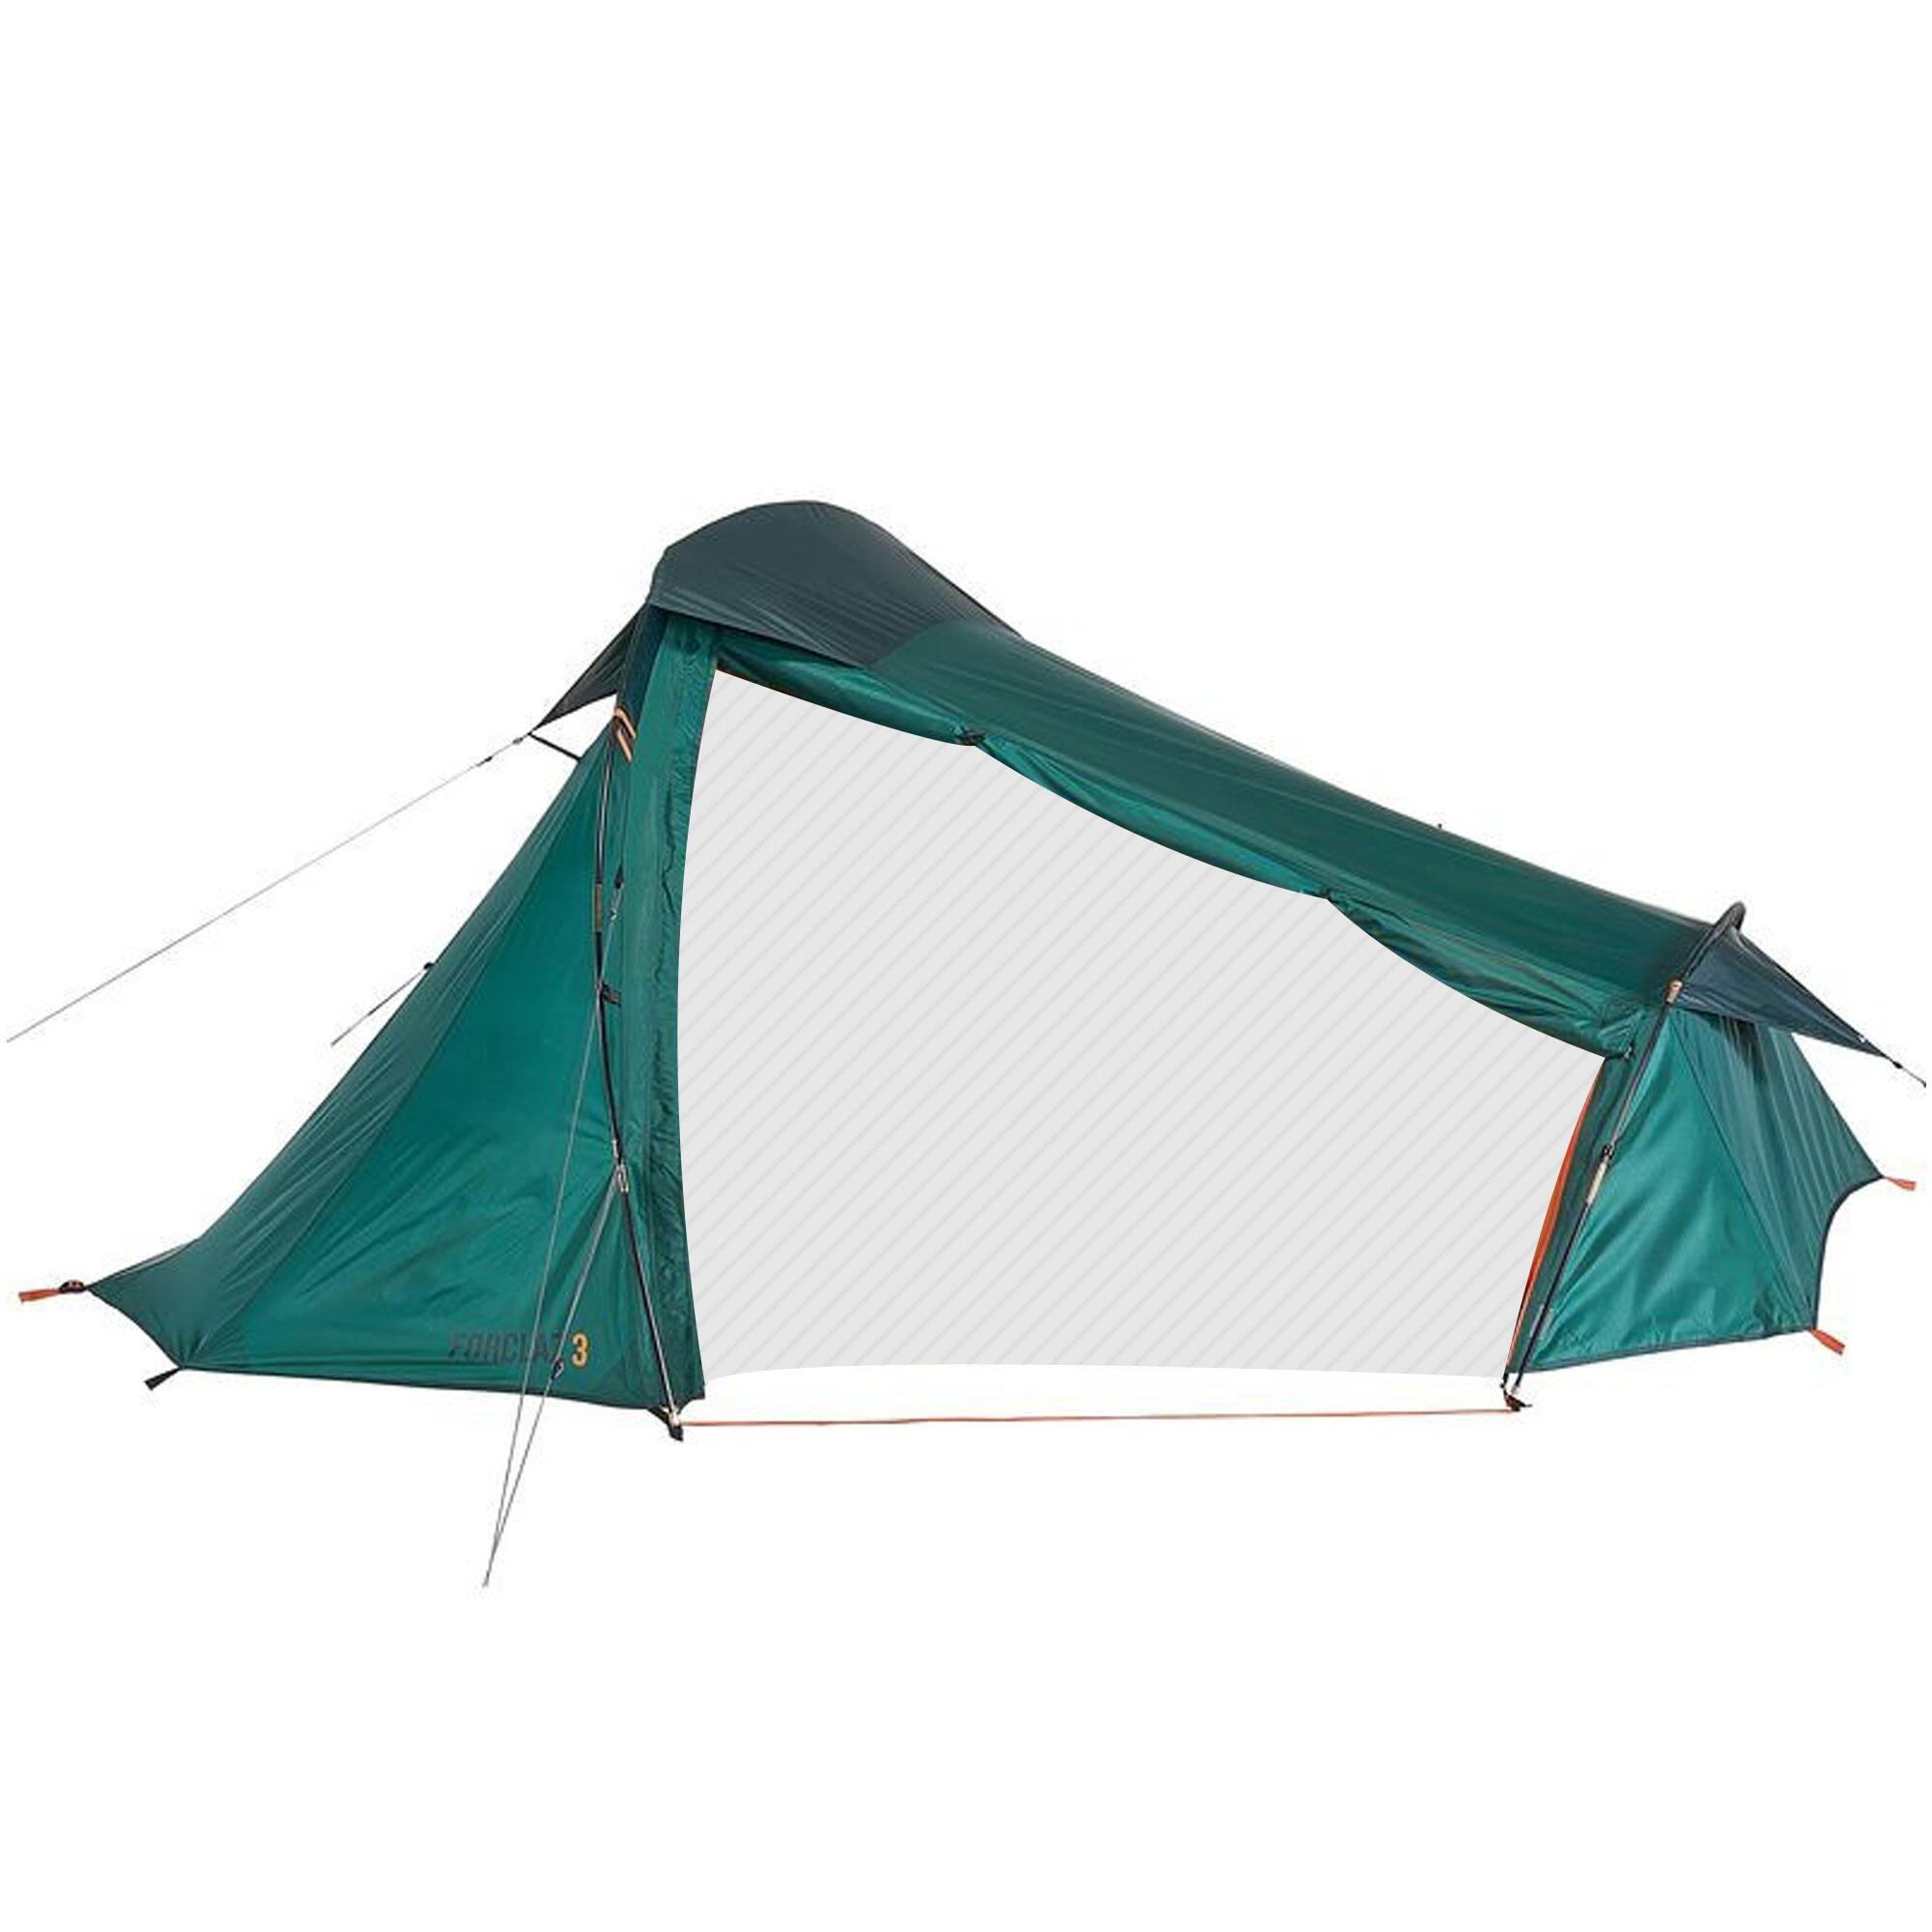 Quechua Buitentent voor de tent Forclaz 3